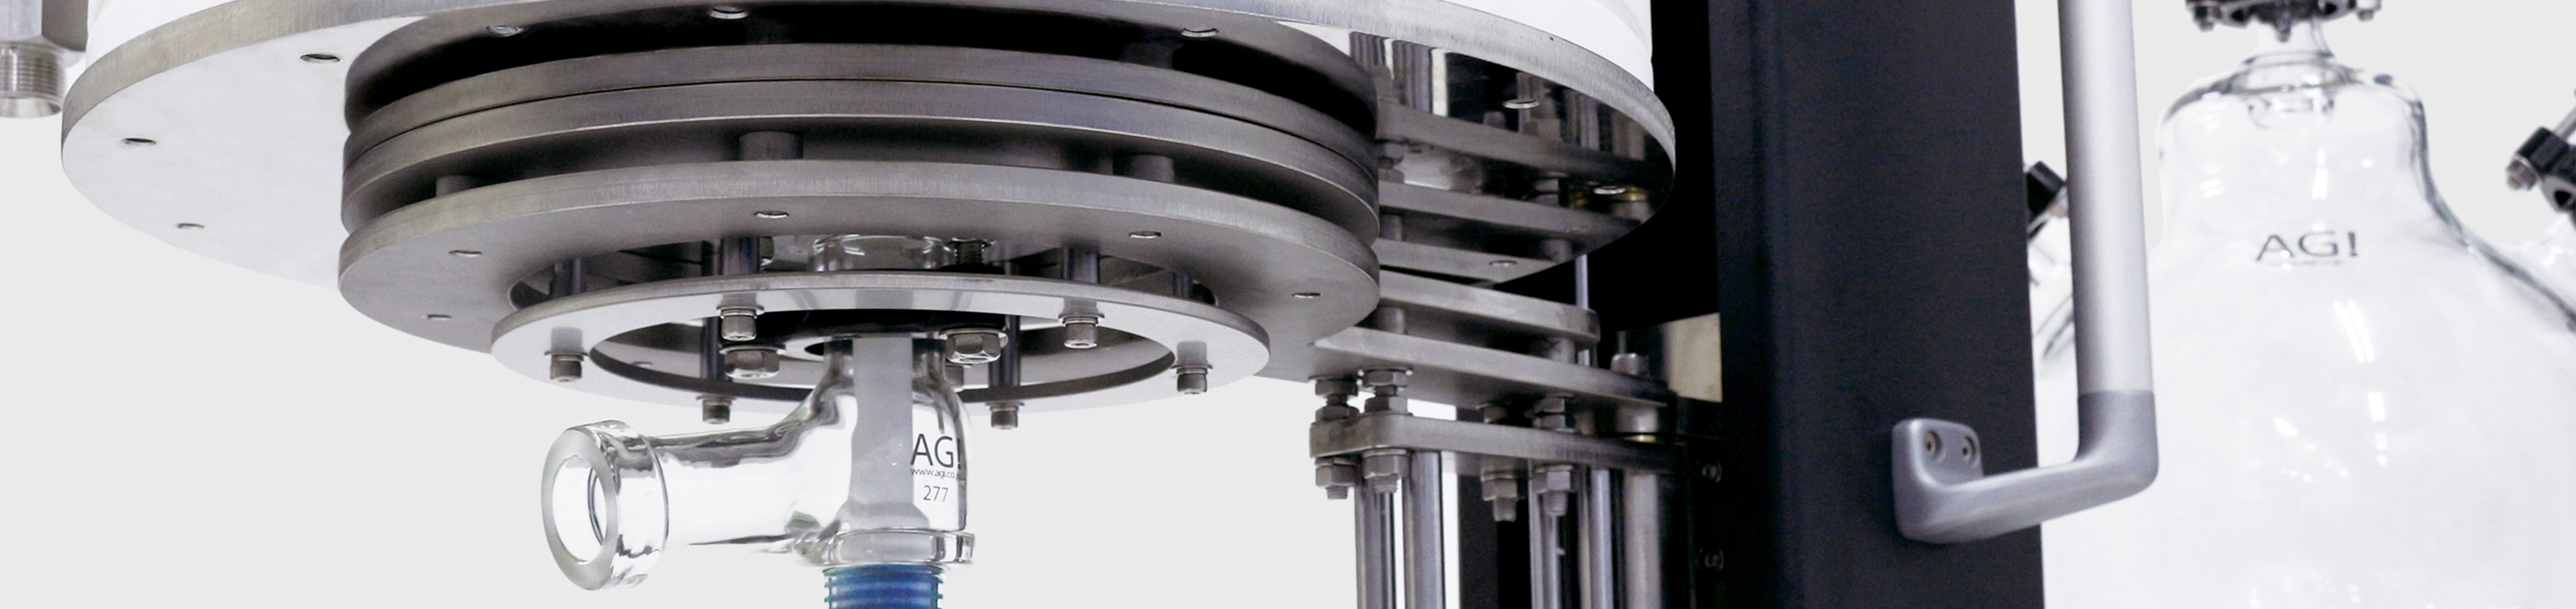 Pilot Filter Reactor PLUS